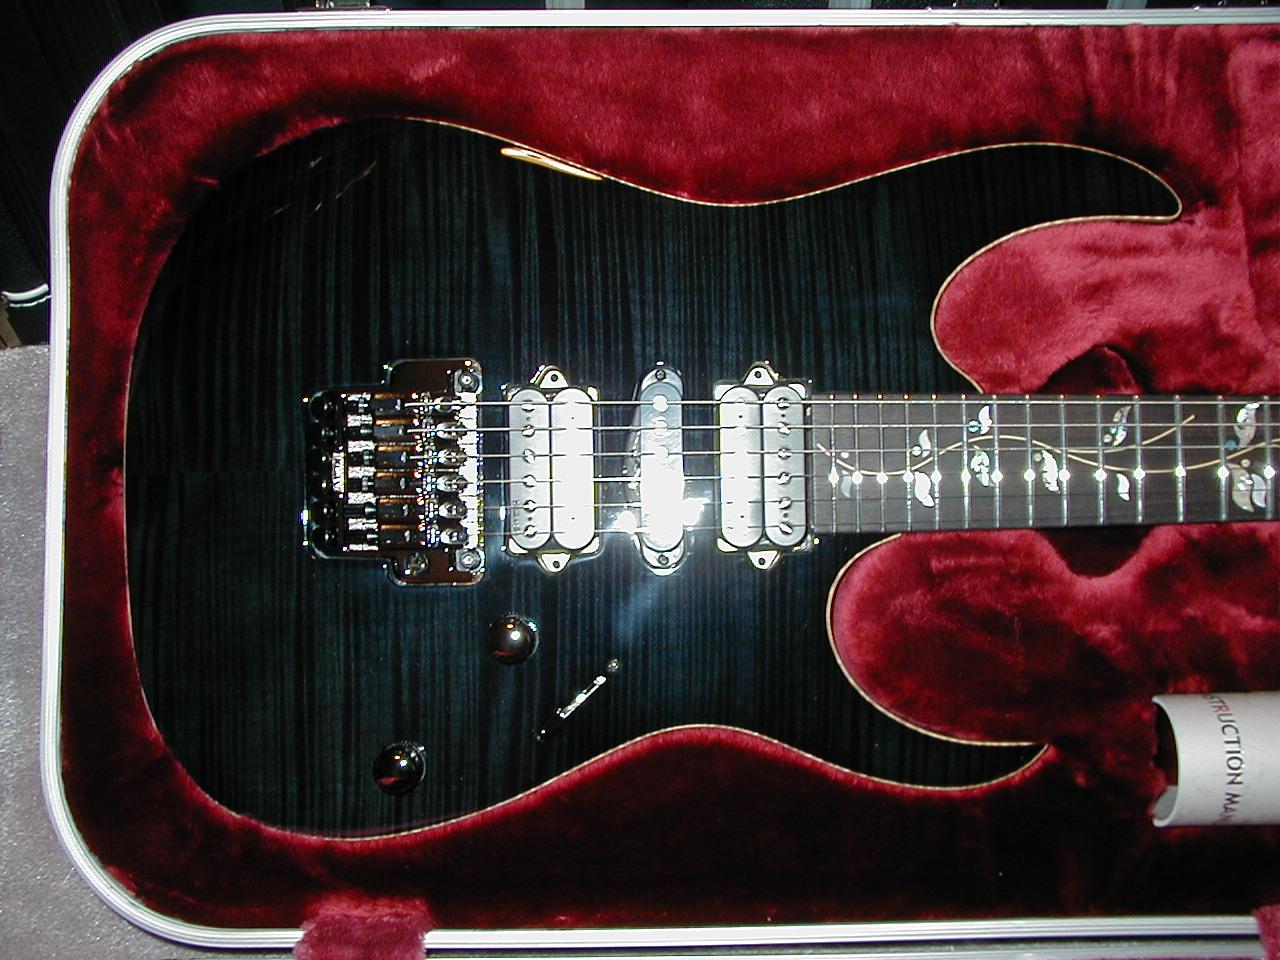 ibanez rg 320 dx wiring diagram 1983 chevy c10 radio qm ultimate guitar